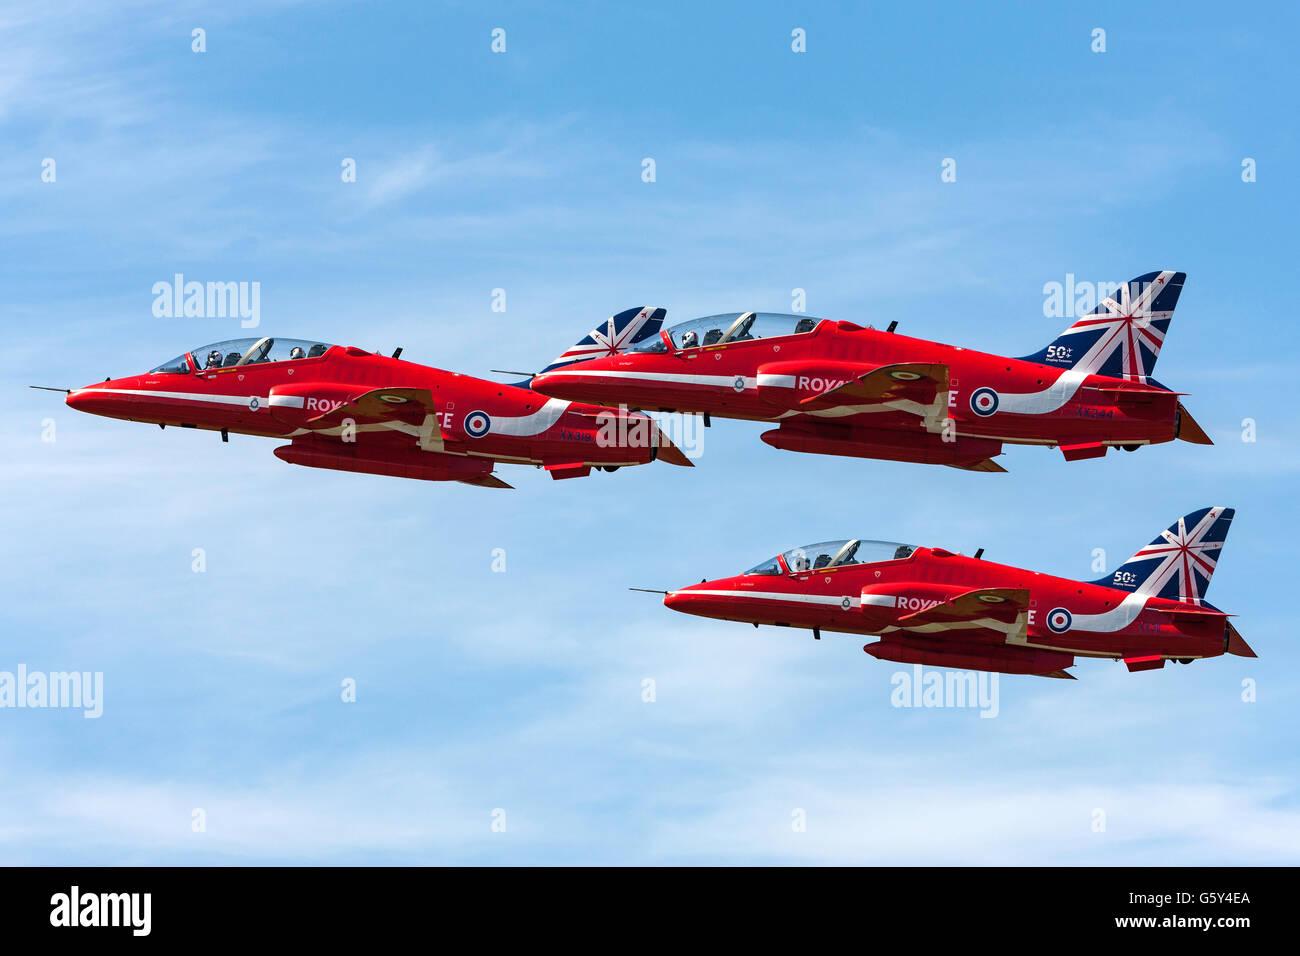 Royal Air Force (RAF) Red Arrows aerobatic display team performing at the Farnborough International Airshow - Stock Image